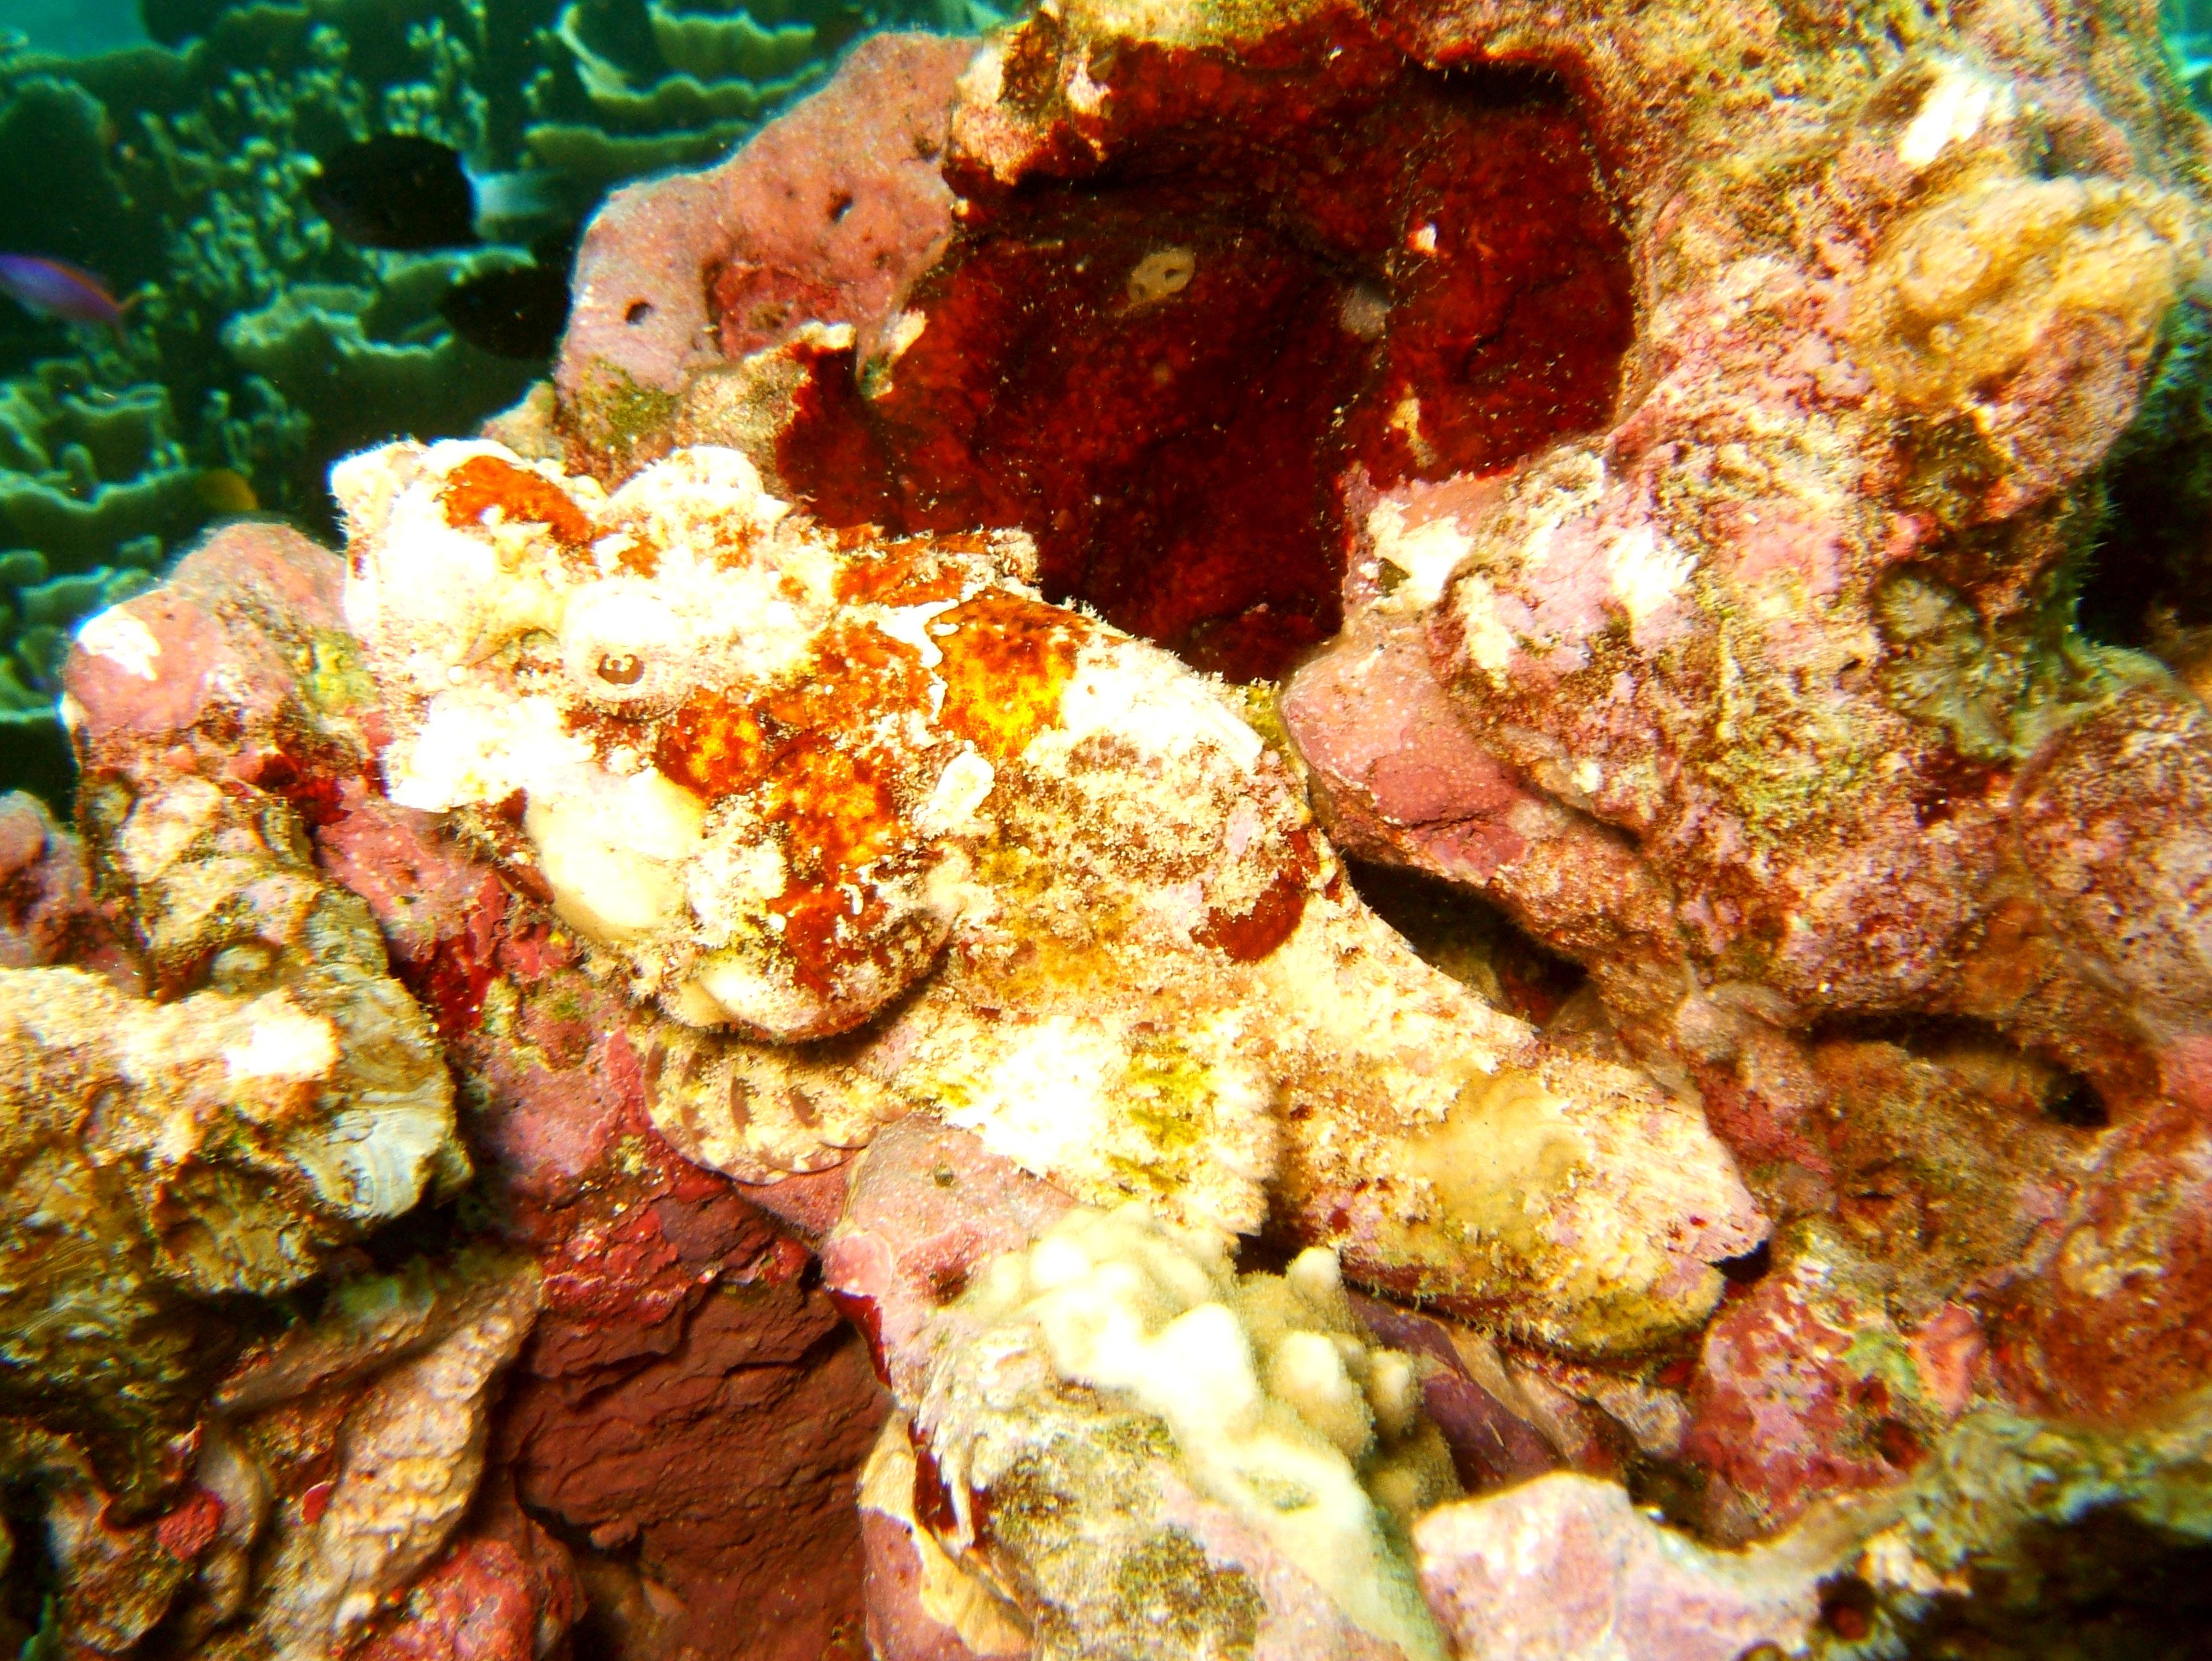 Philippines Cebu Moal Boal 20051227 Dive 1 Pescador Island 32